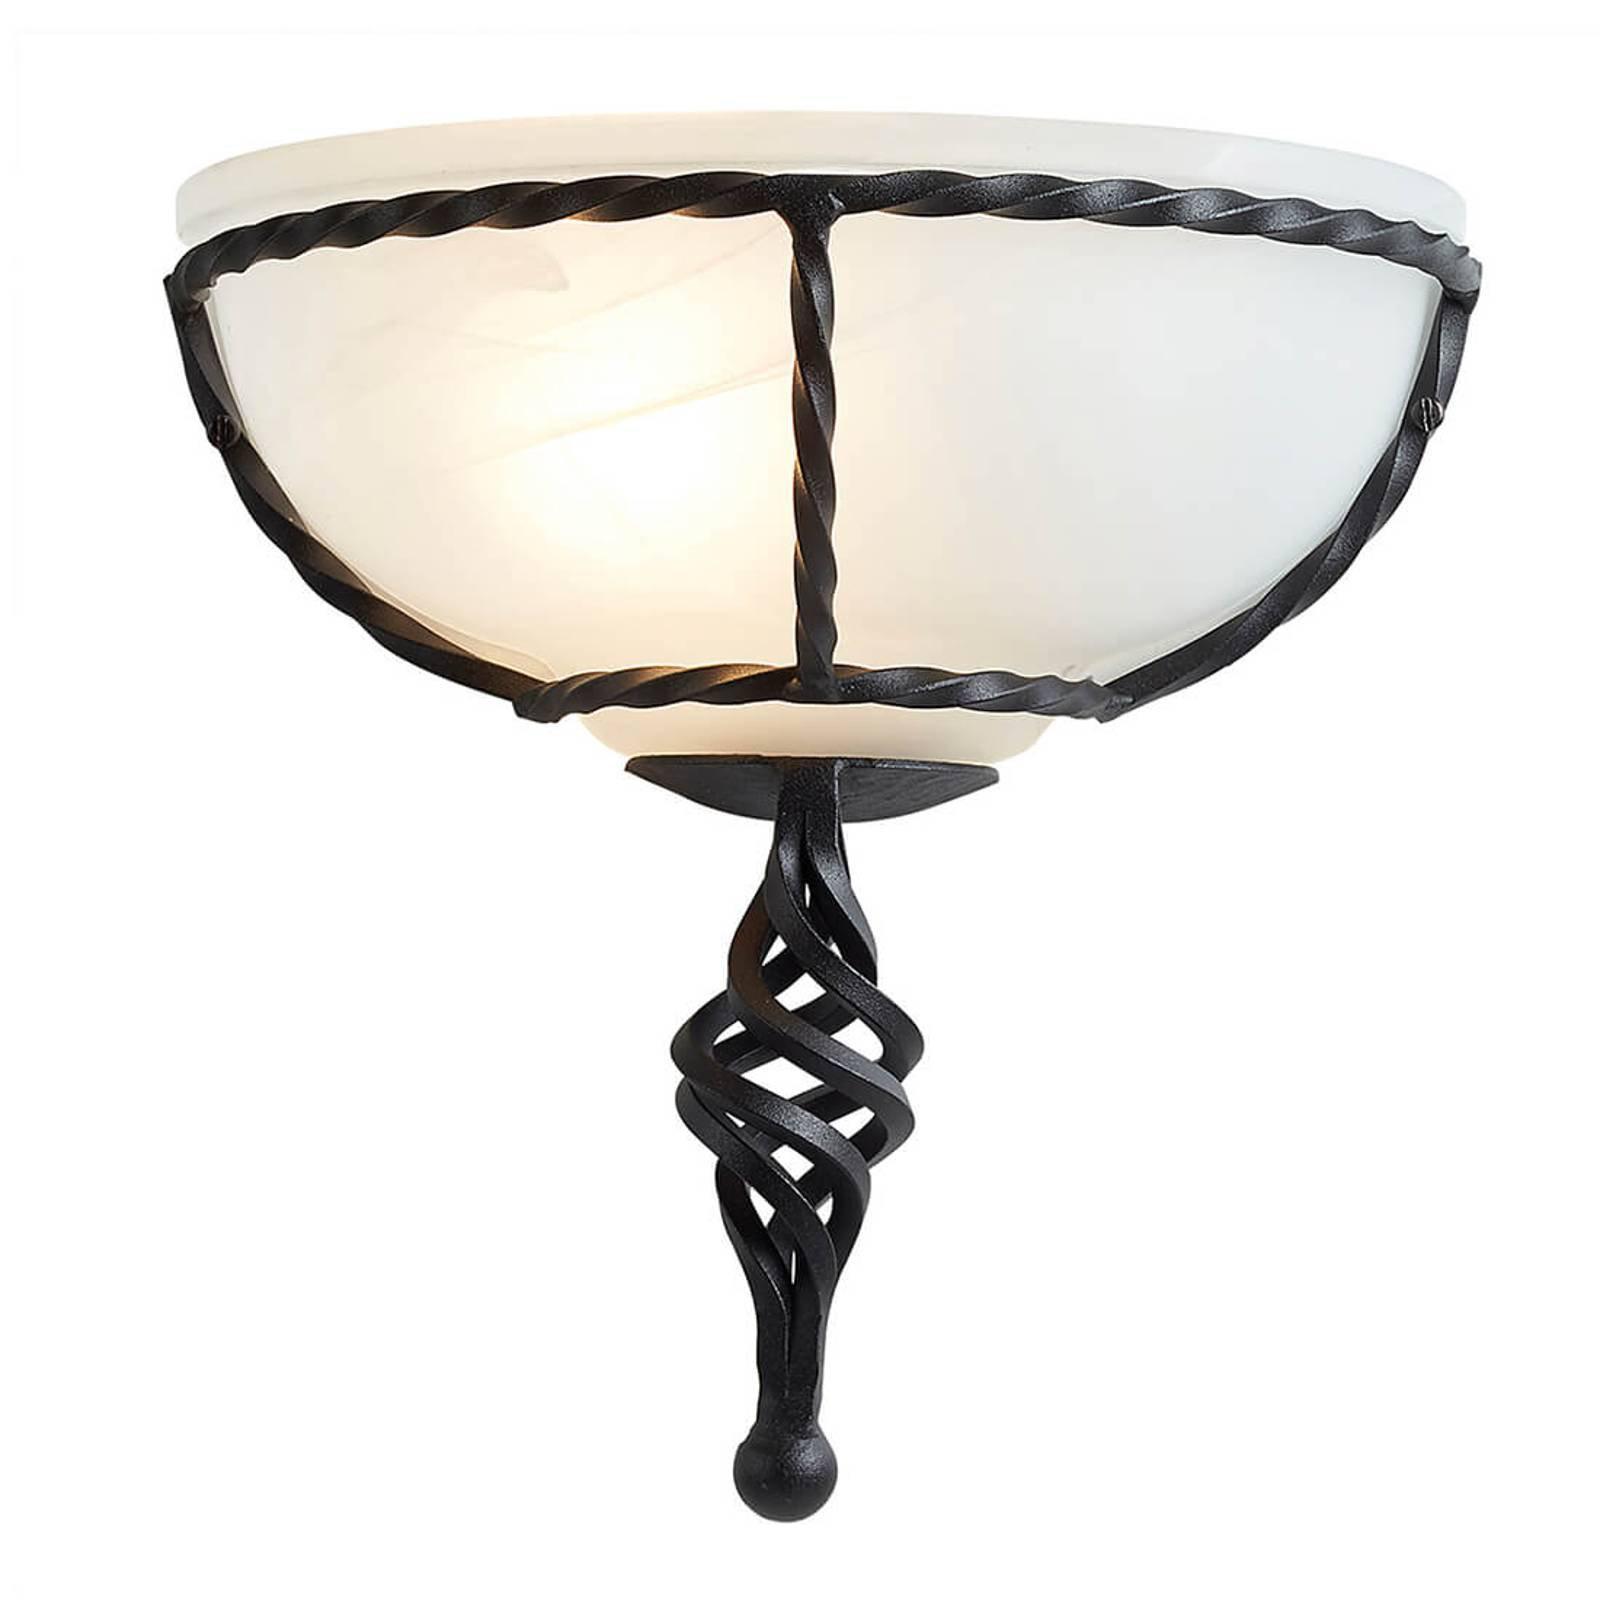 Vegglampe Pembroke, svart stamme